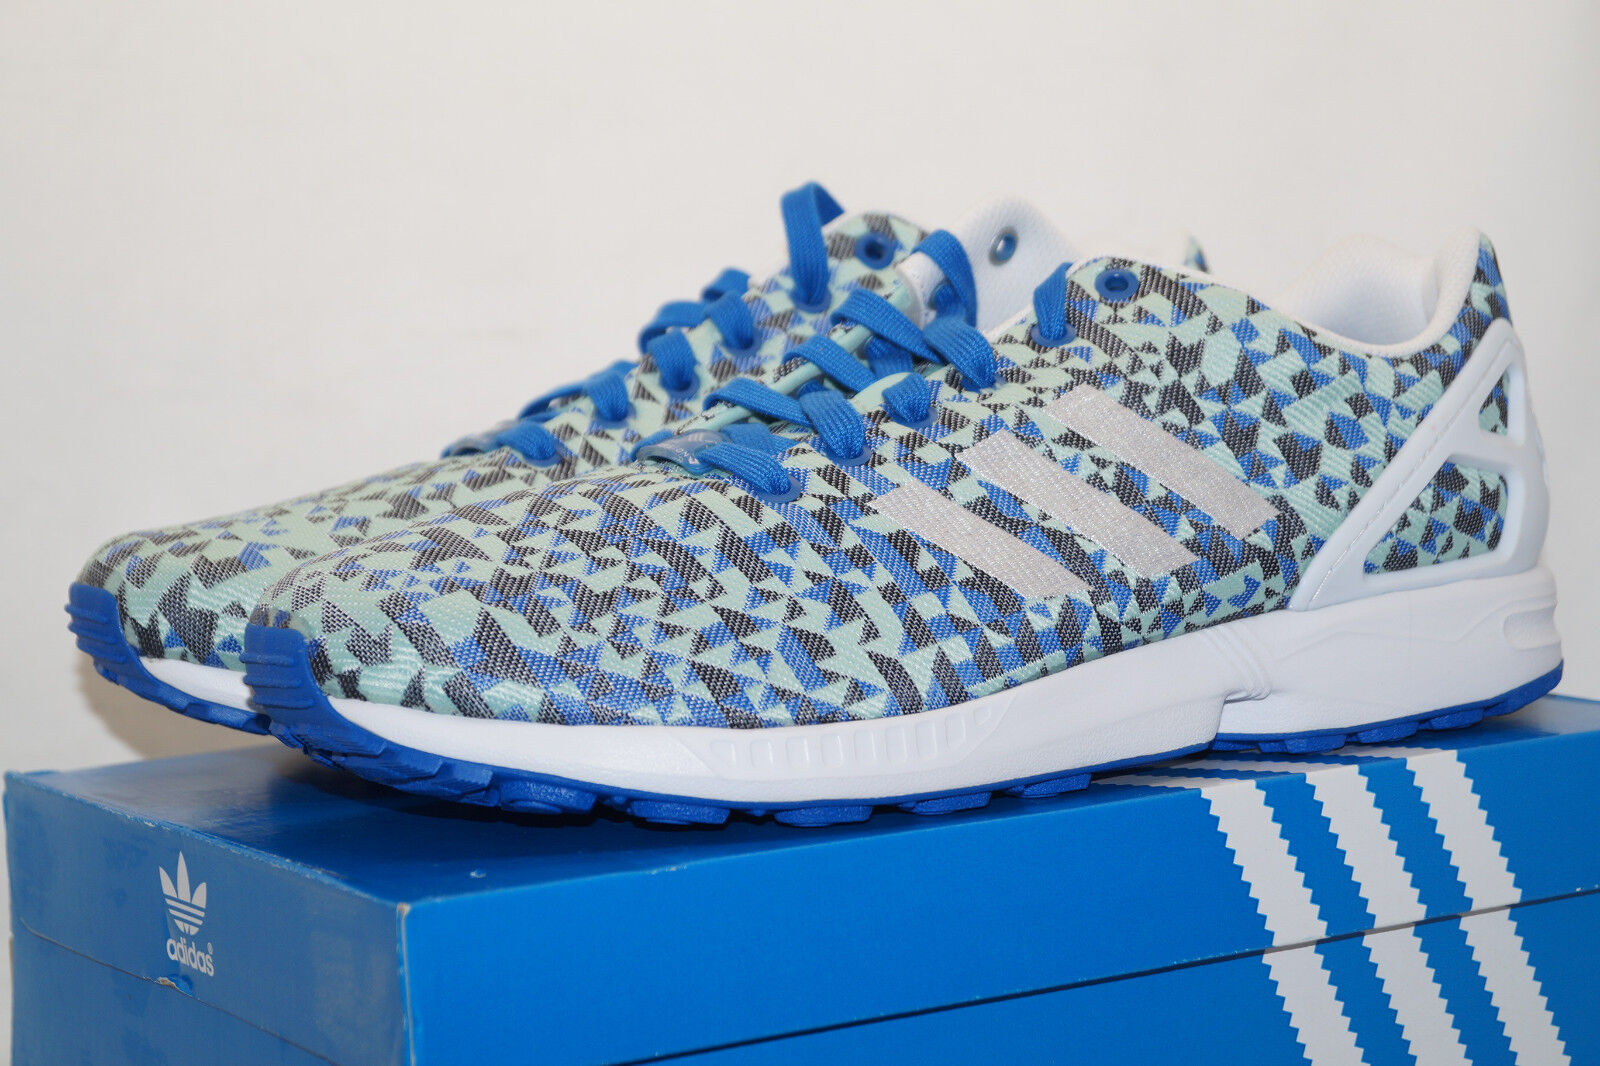 Adidas Originals ZX Flux torsion weave UE 46.6 uk11.5 azul verde claro b34474